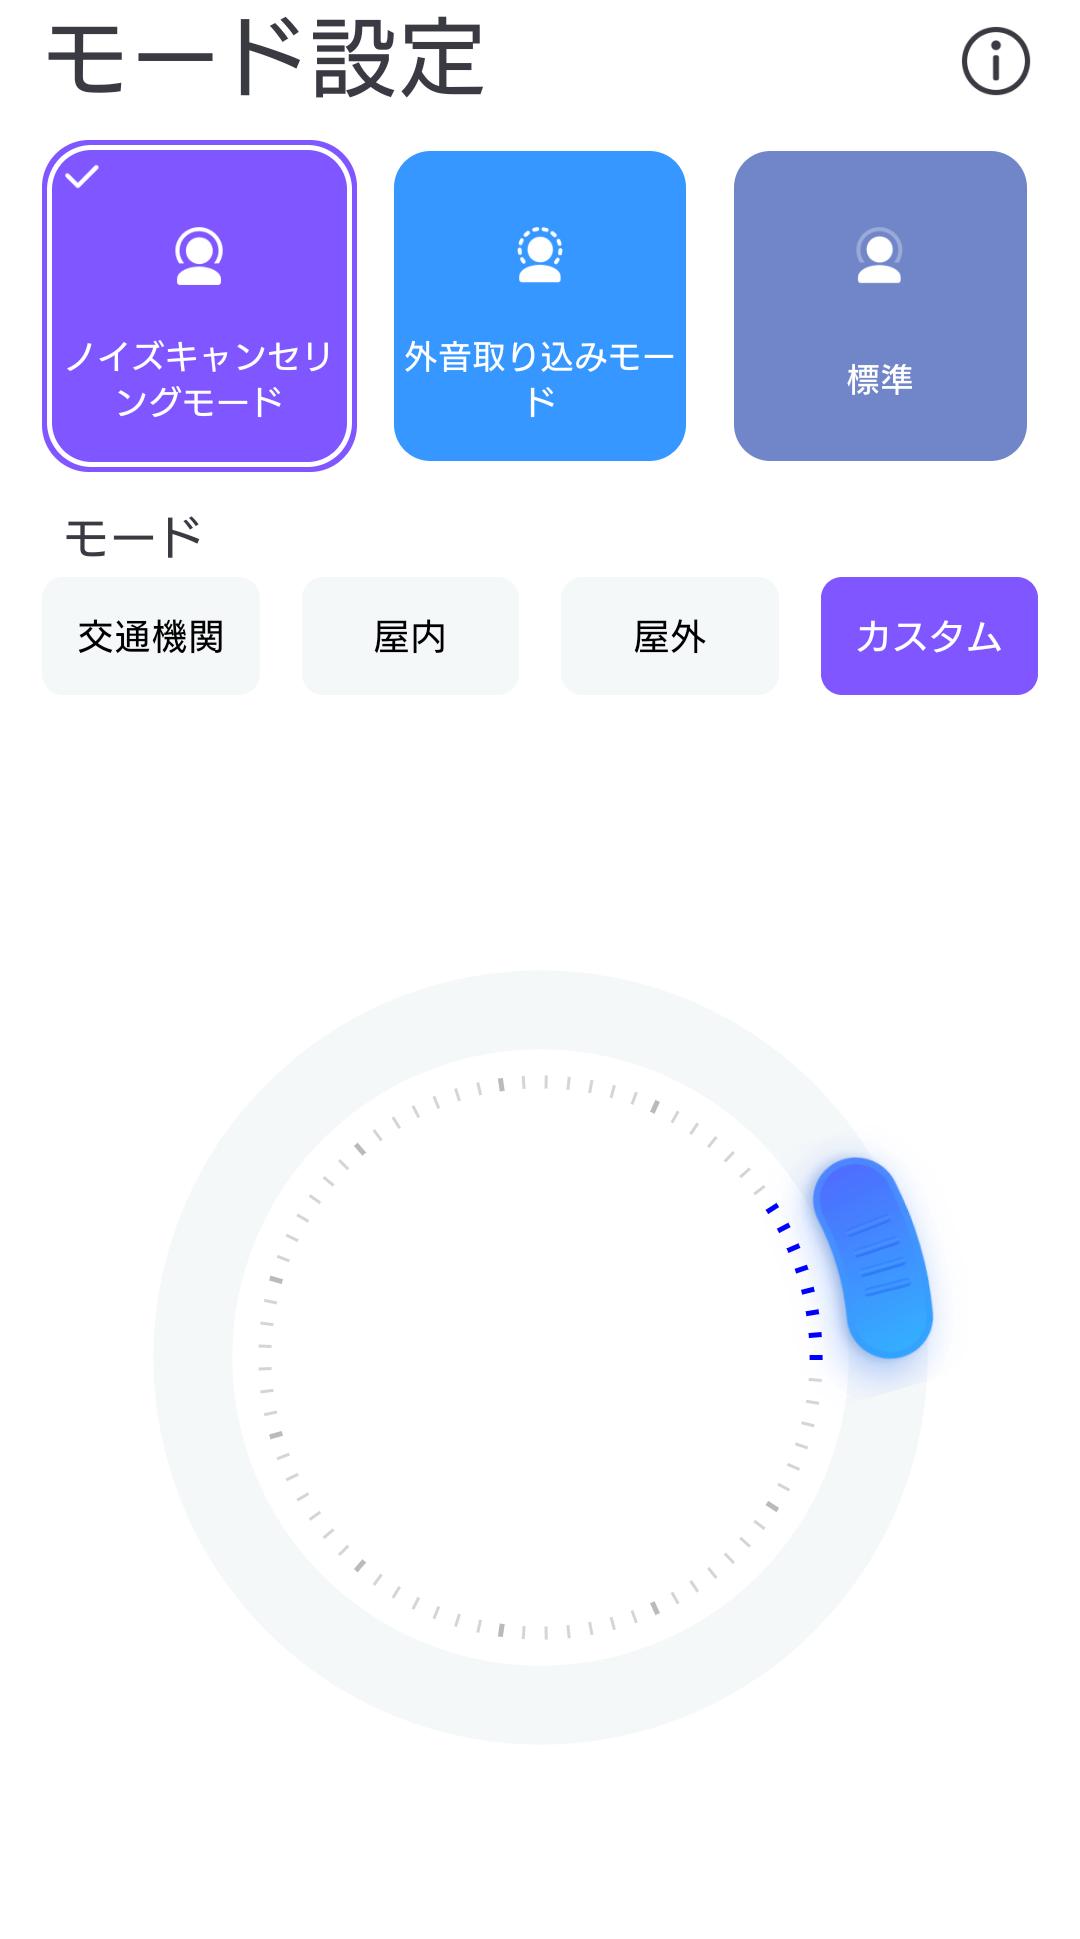 Screenshot 20210513 223610 - 【Anker】Soundcore Liberty Air 2 Proをレビュー!~コスパ抜群の機能性を搭載した完全ワイヤレスイヤホン!~